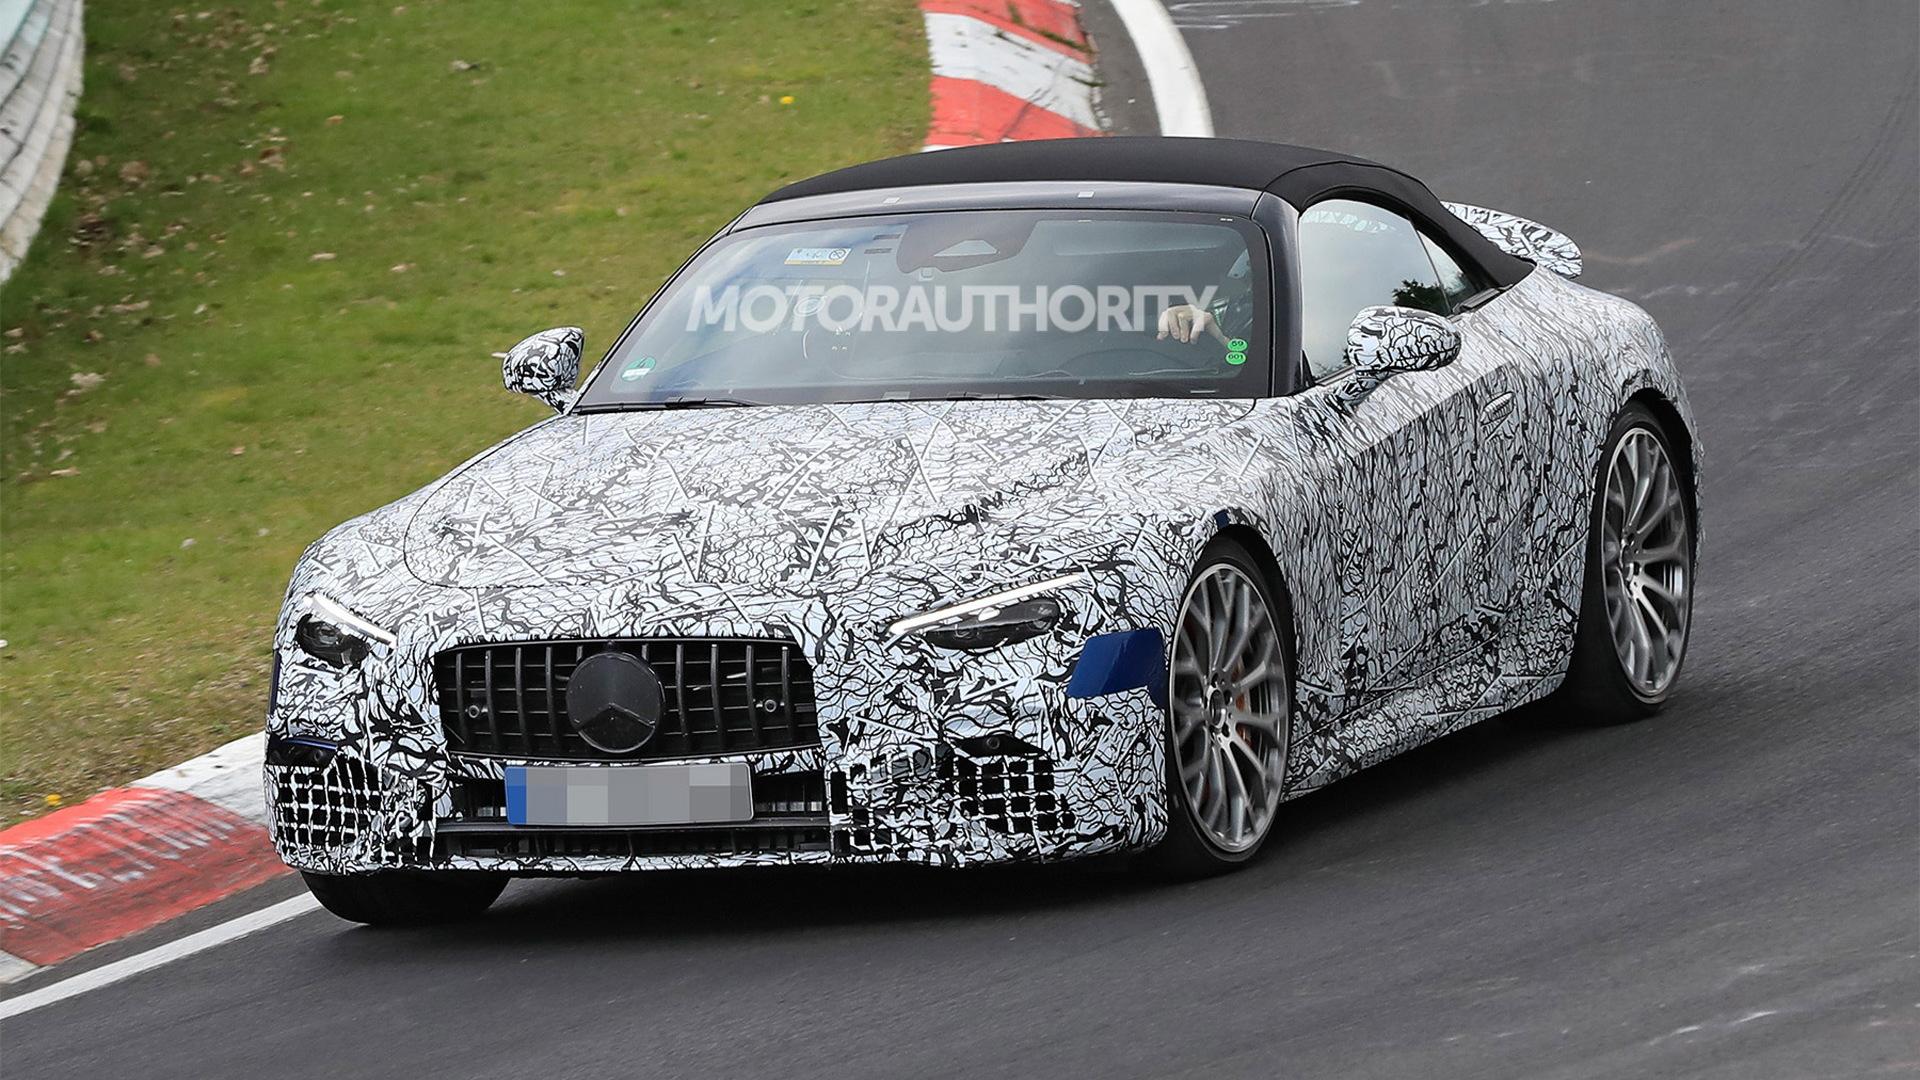 2022 Mercedes-Benz AMG SL Roadster spy shots - Photo credit:S. Baldauf/SB-Medien